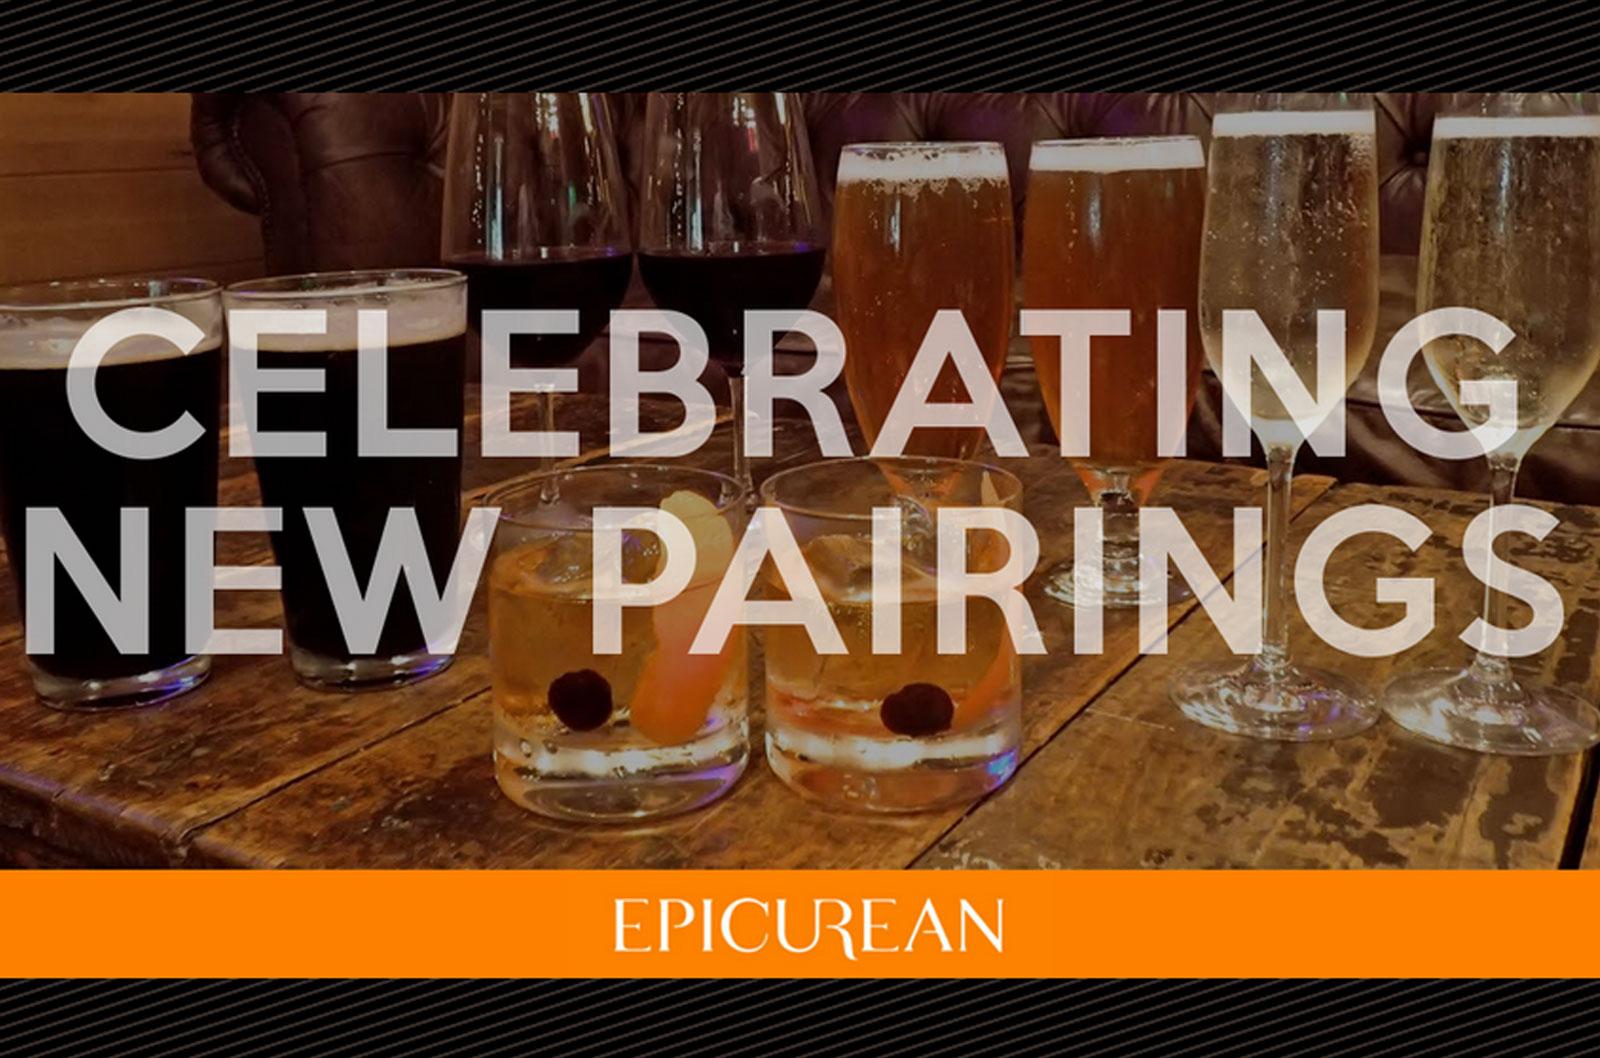 Celebrating-New-Pairings-pr